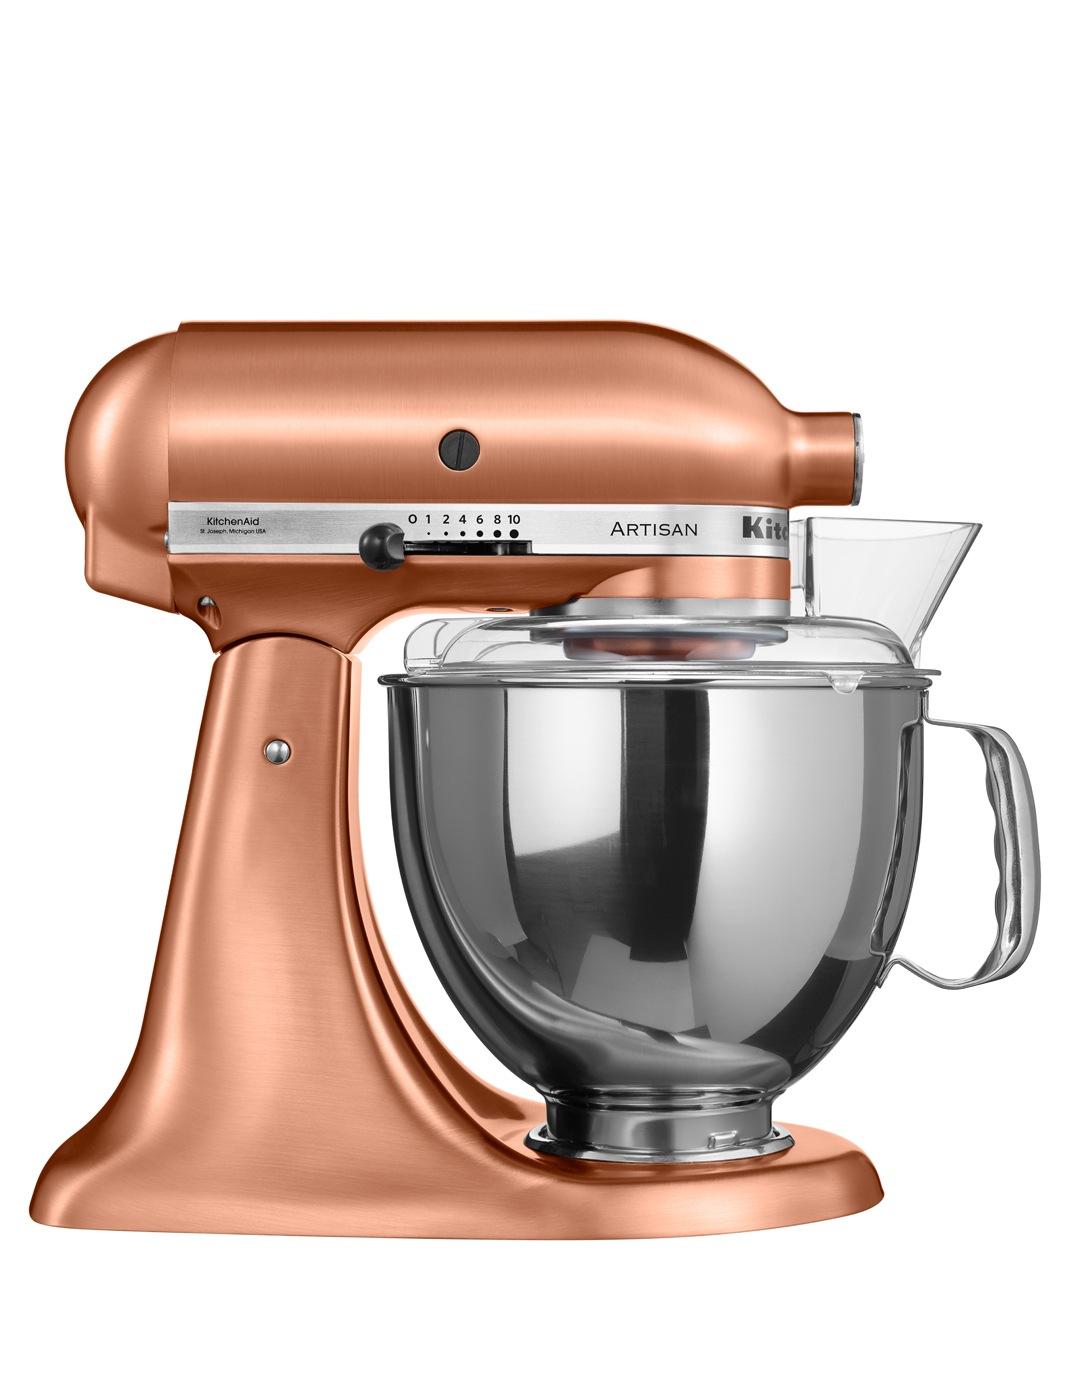 Kitchenaid Ksm150 Artisan Stand Mixer Satin Copper